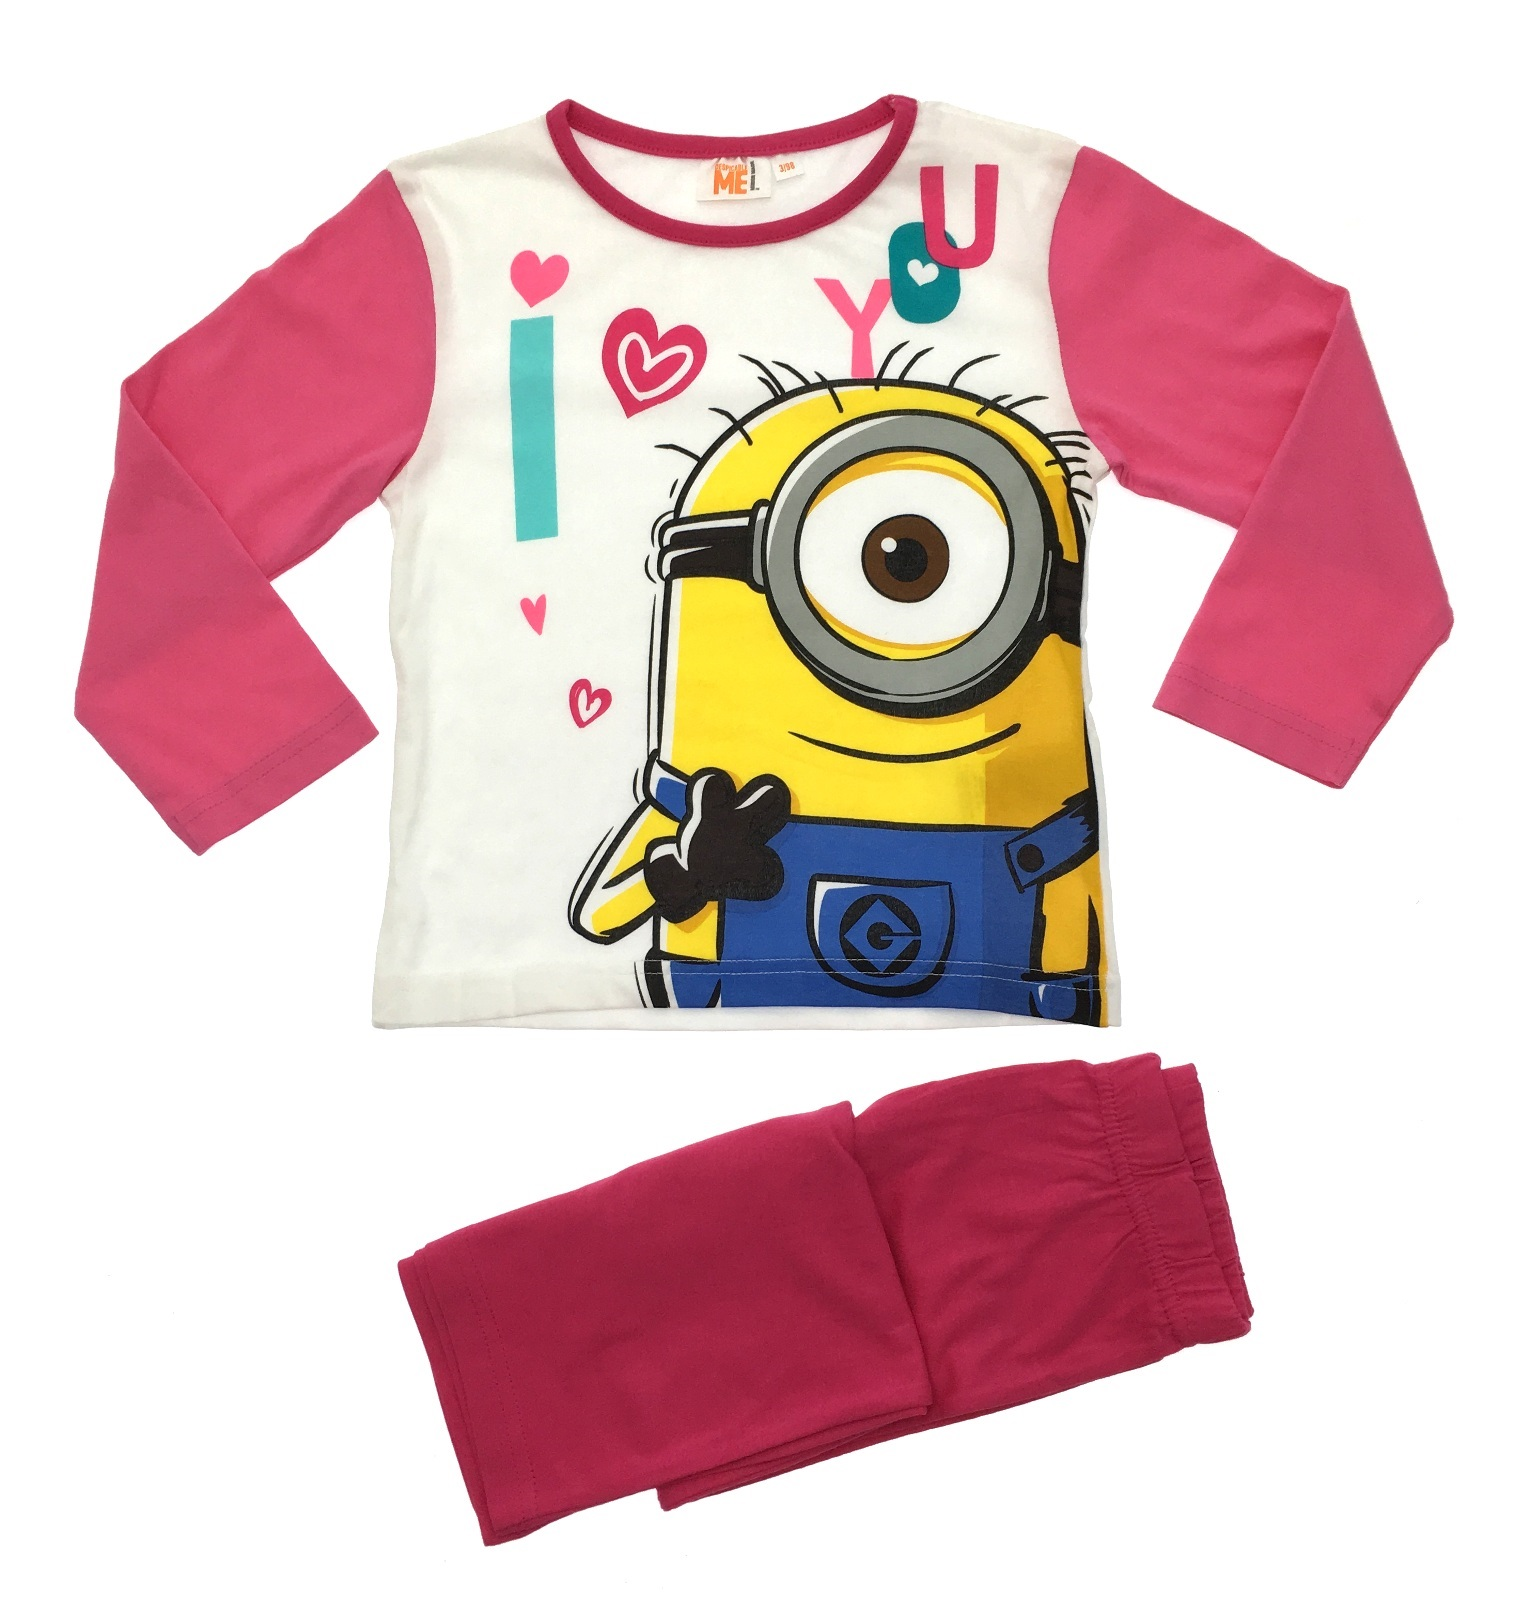 8716f9fc8 Kids Girls Pyjamas Despicable Me Minions Long 2 Piece Pj s Set Size ...